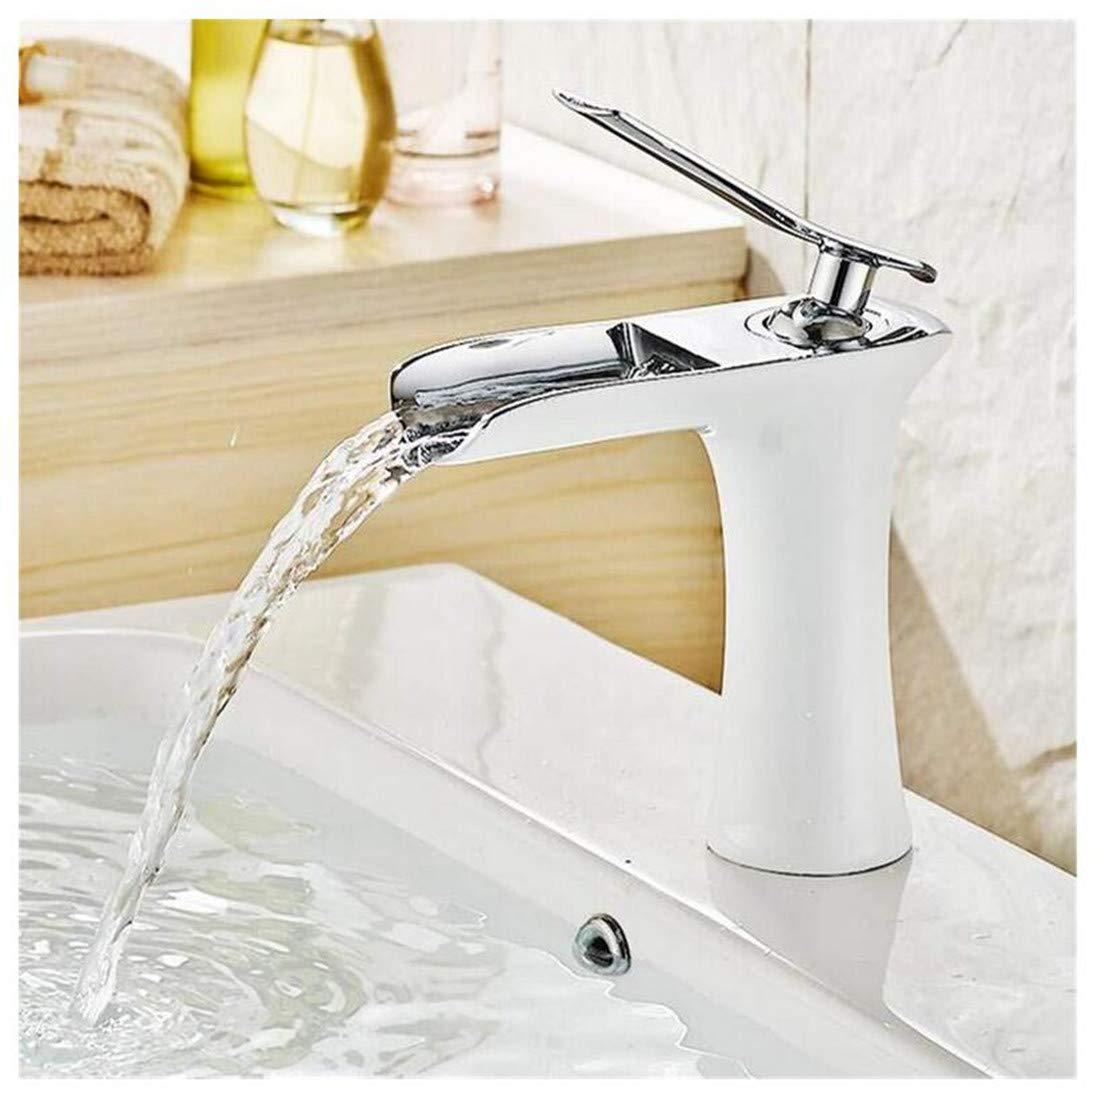 Kitchen Bath Basin Sink Bathroom Taps Faucet Washbasin Mixer Brass Waterfall Bathroom Faucet Ctzl1214